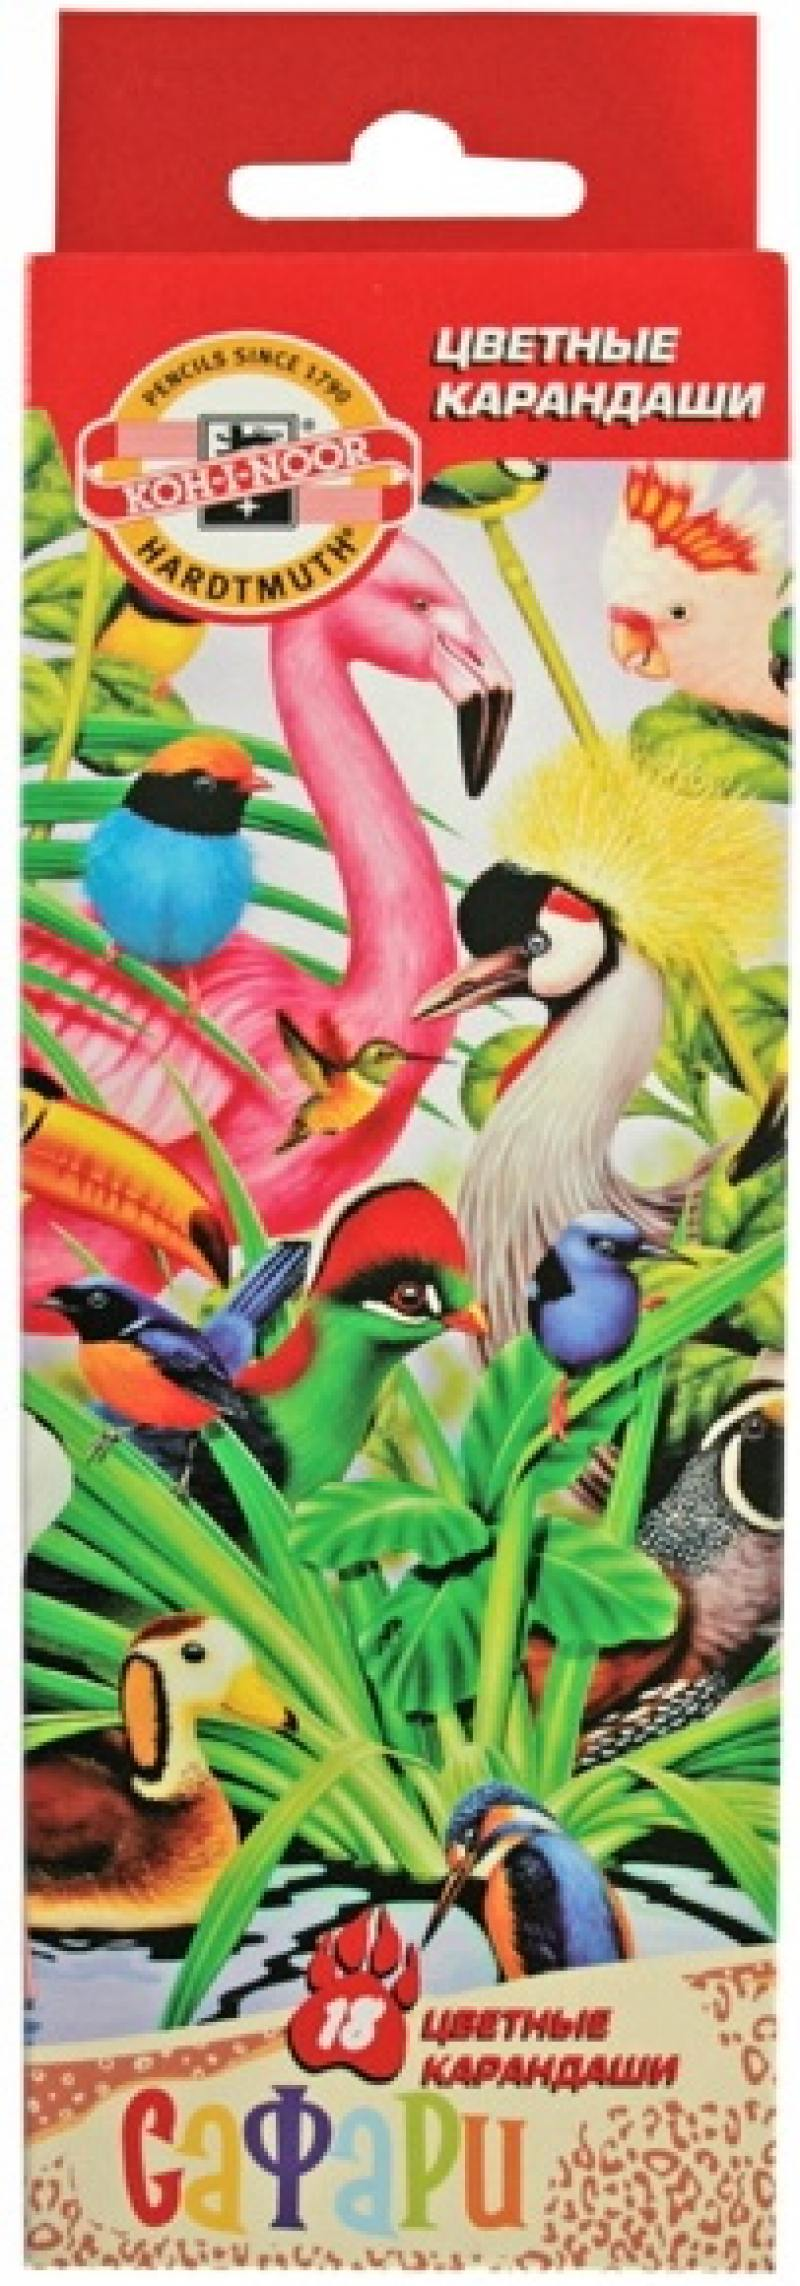 Набор цветных карандашей Koh-i-Noor САФАРИ 18 шт 17.5 см 3553/18 S KS 3553/18 S KS